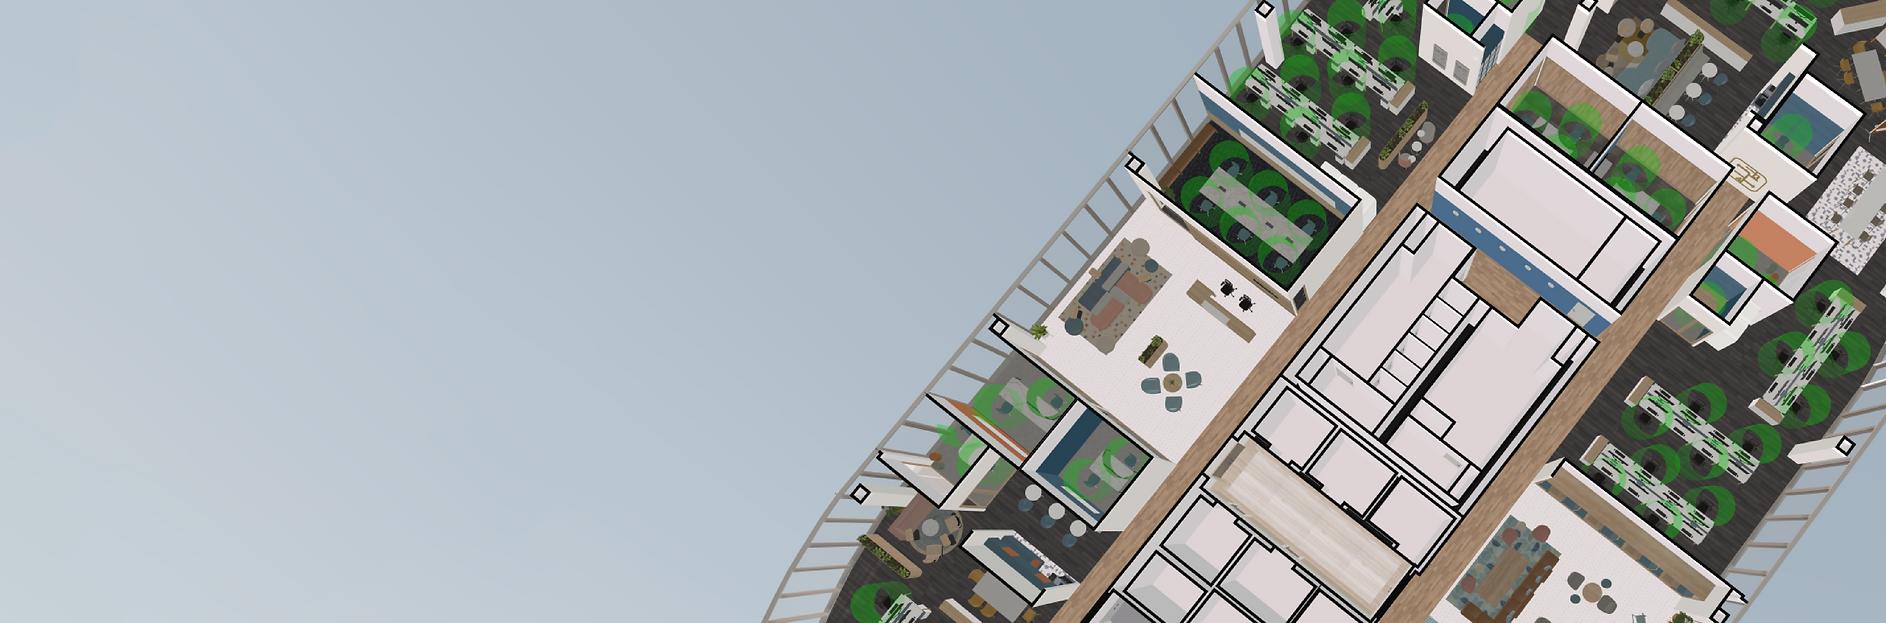 Saltmine 3D floorplan